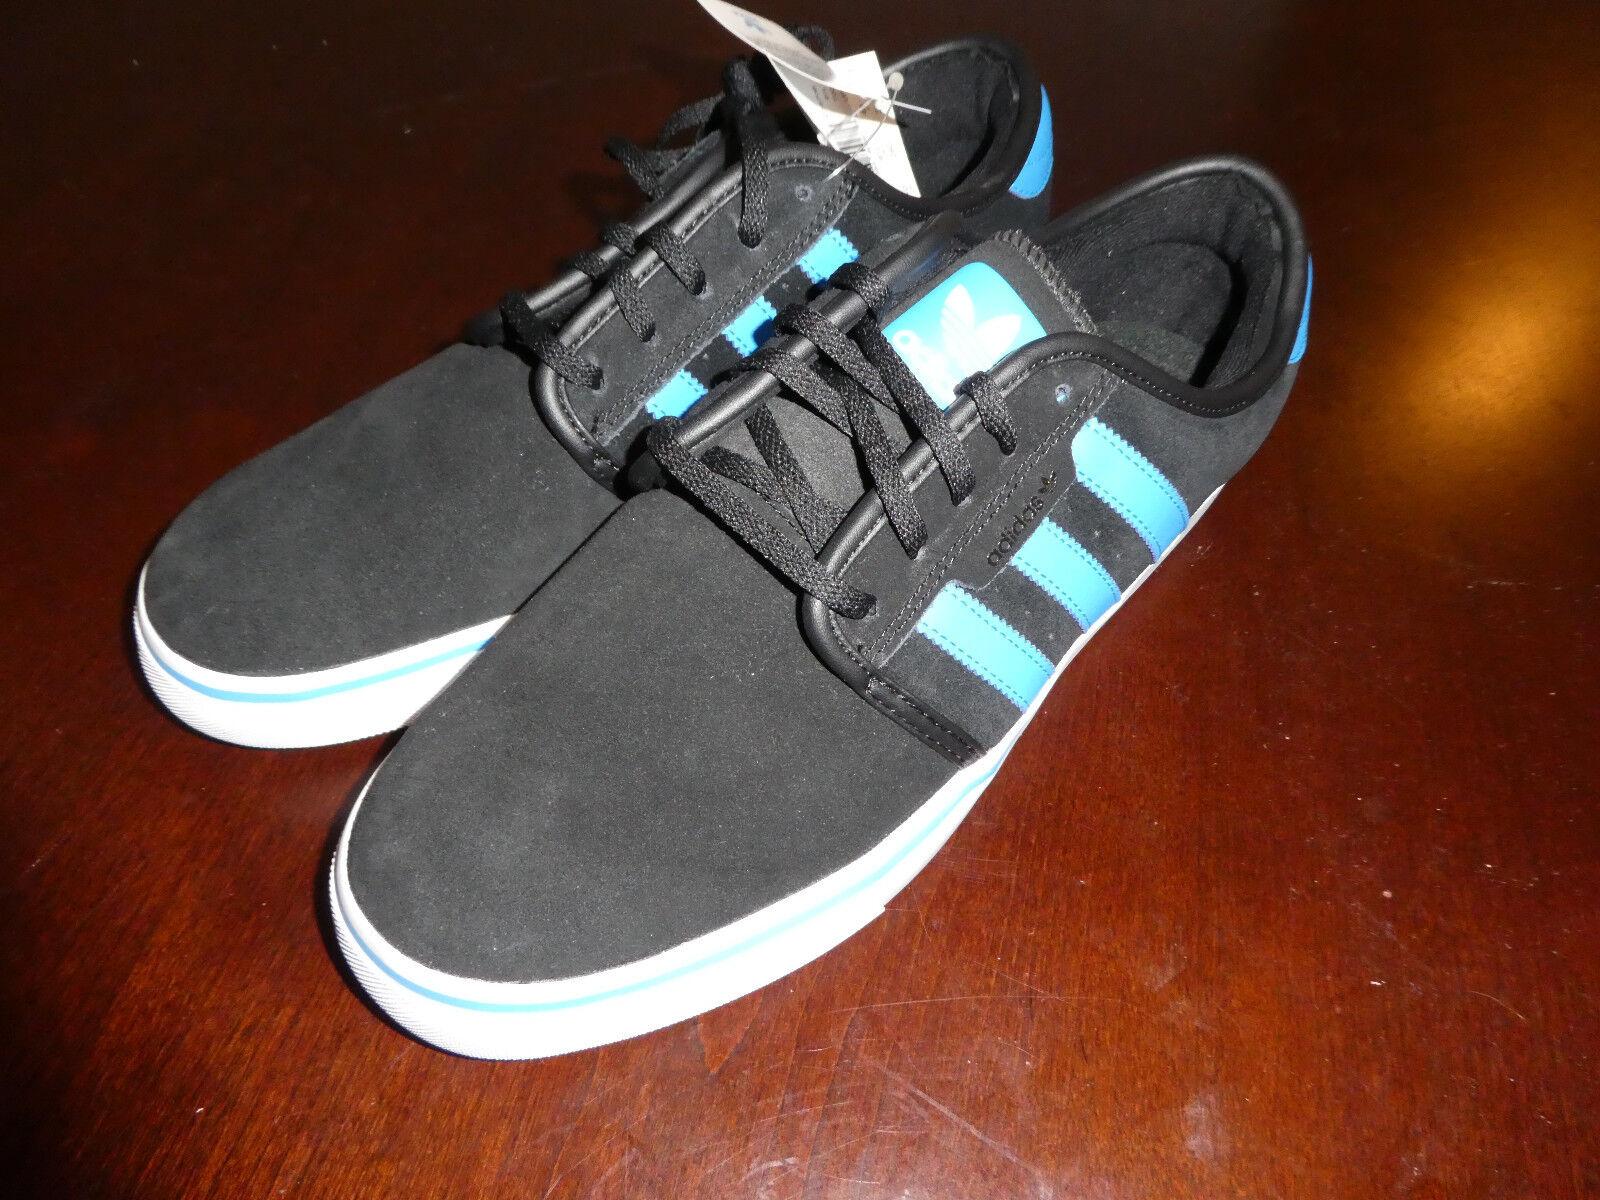 Adidas 10 Seeley mens shoes size 10 Adidas black blue new sneakers e88ebf